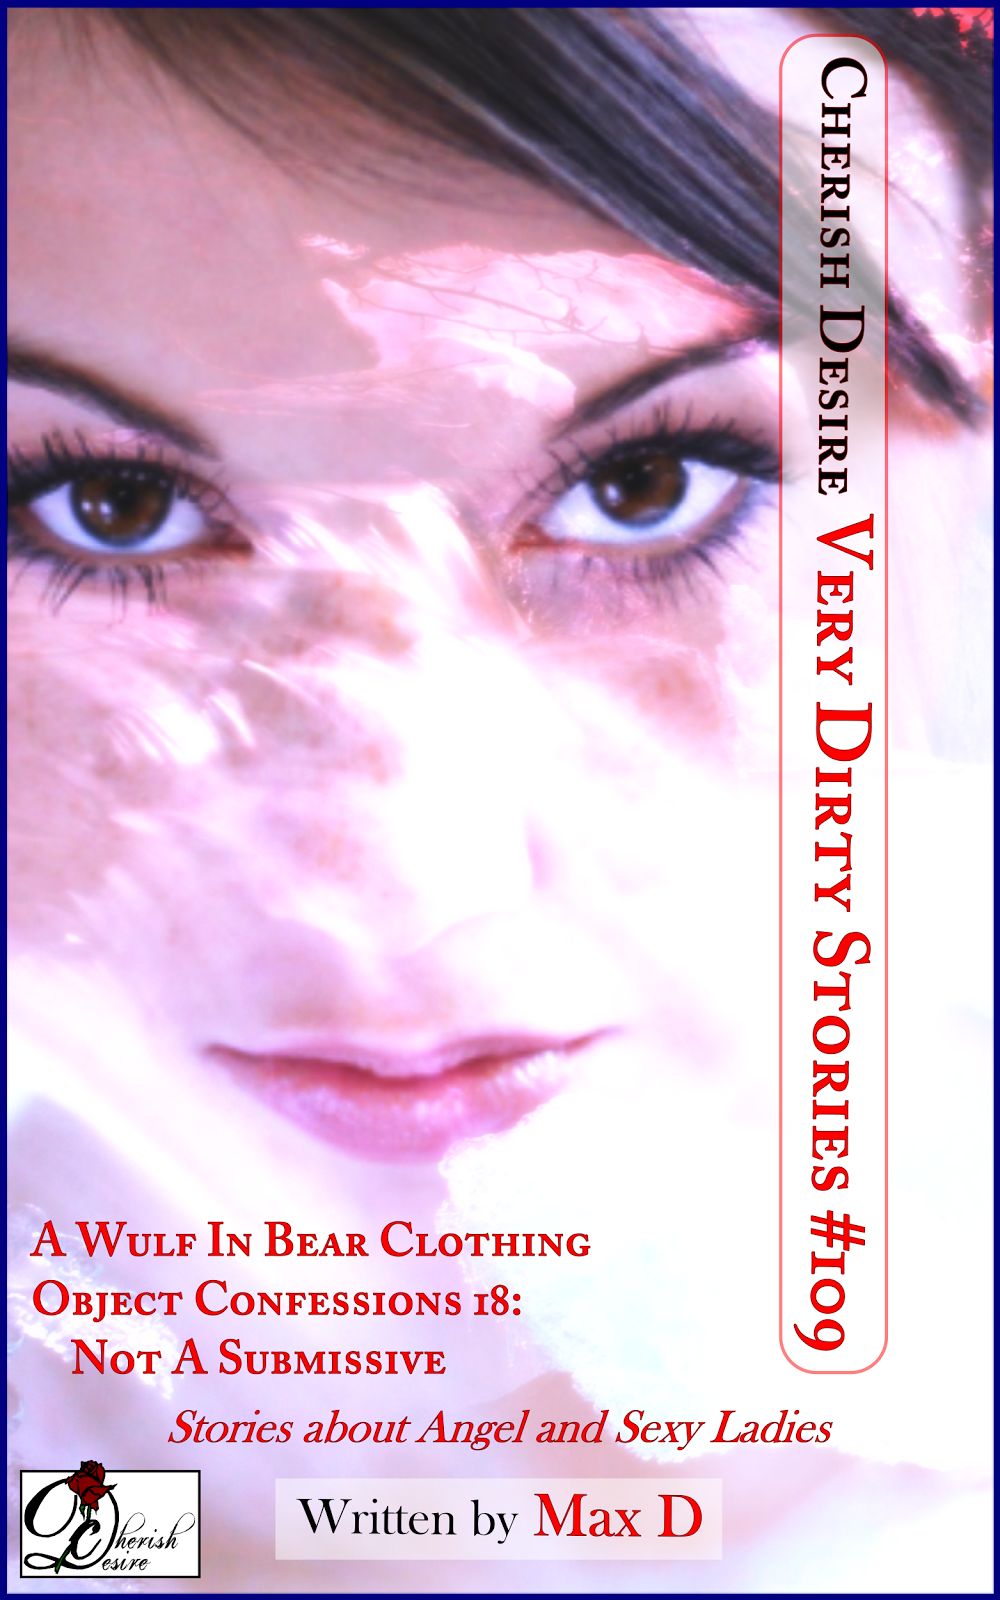 Cherish Desire: Very Dirty Stories #109, Max D, erotica